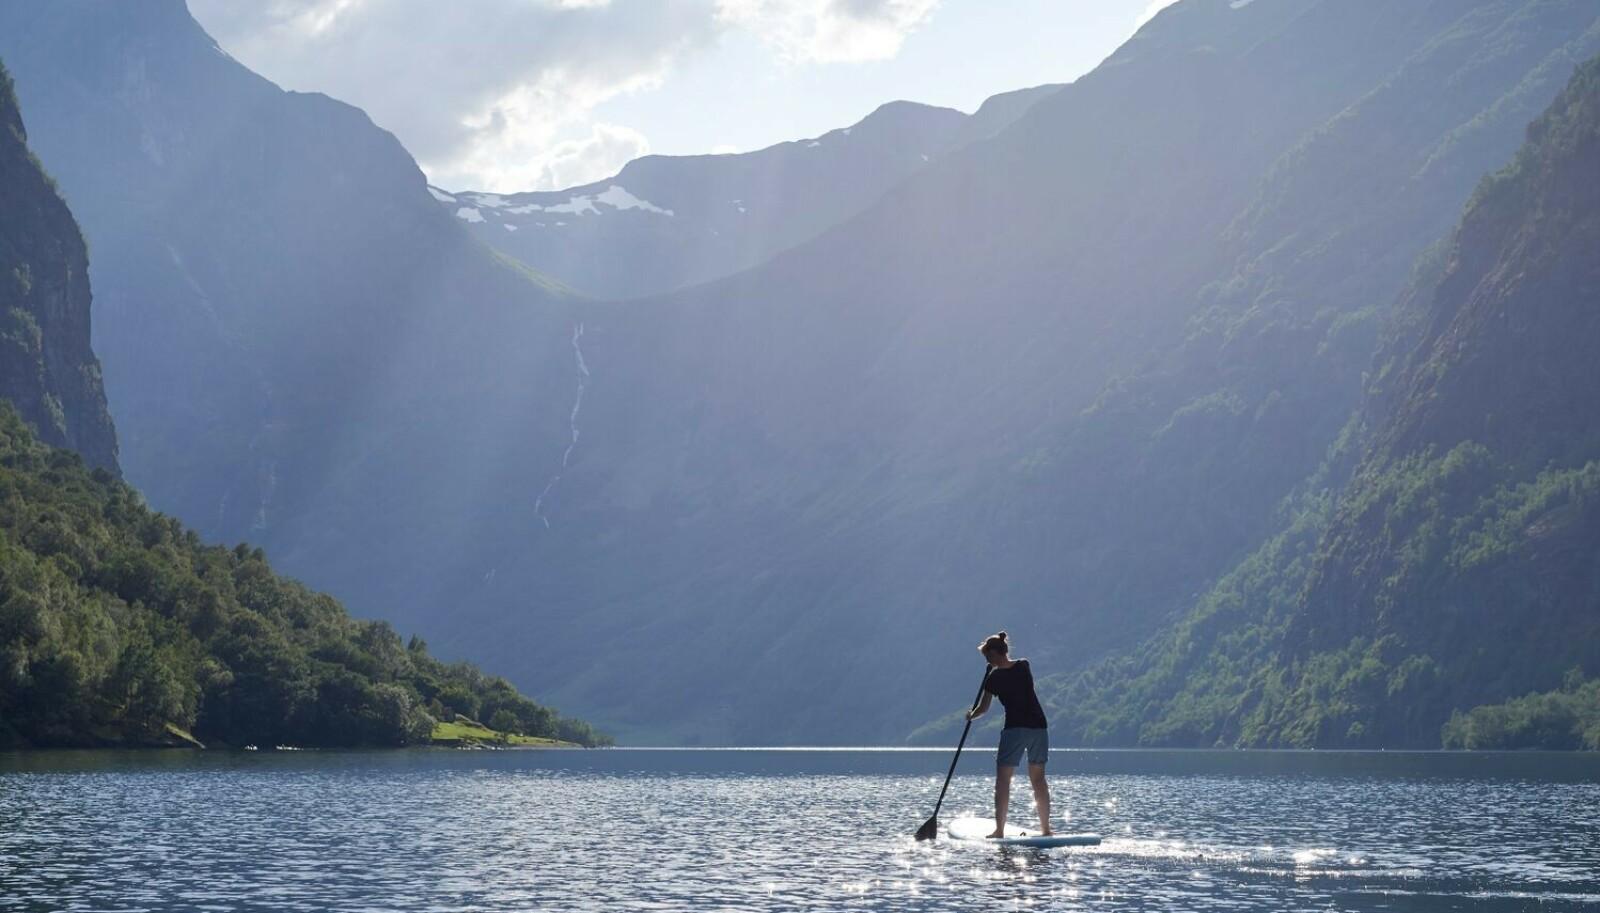 <strong>I VANNFLATEN:</strong> SUP eller ståpadling er blitt en populær aktivitet i norske fjorder, som her i Nærøyfjord. FOTO: Visitnorway.no